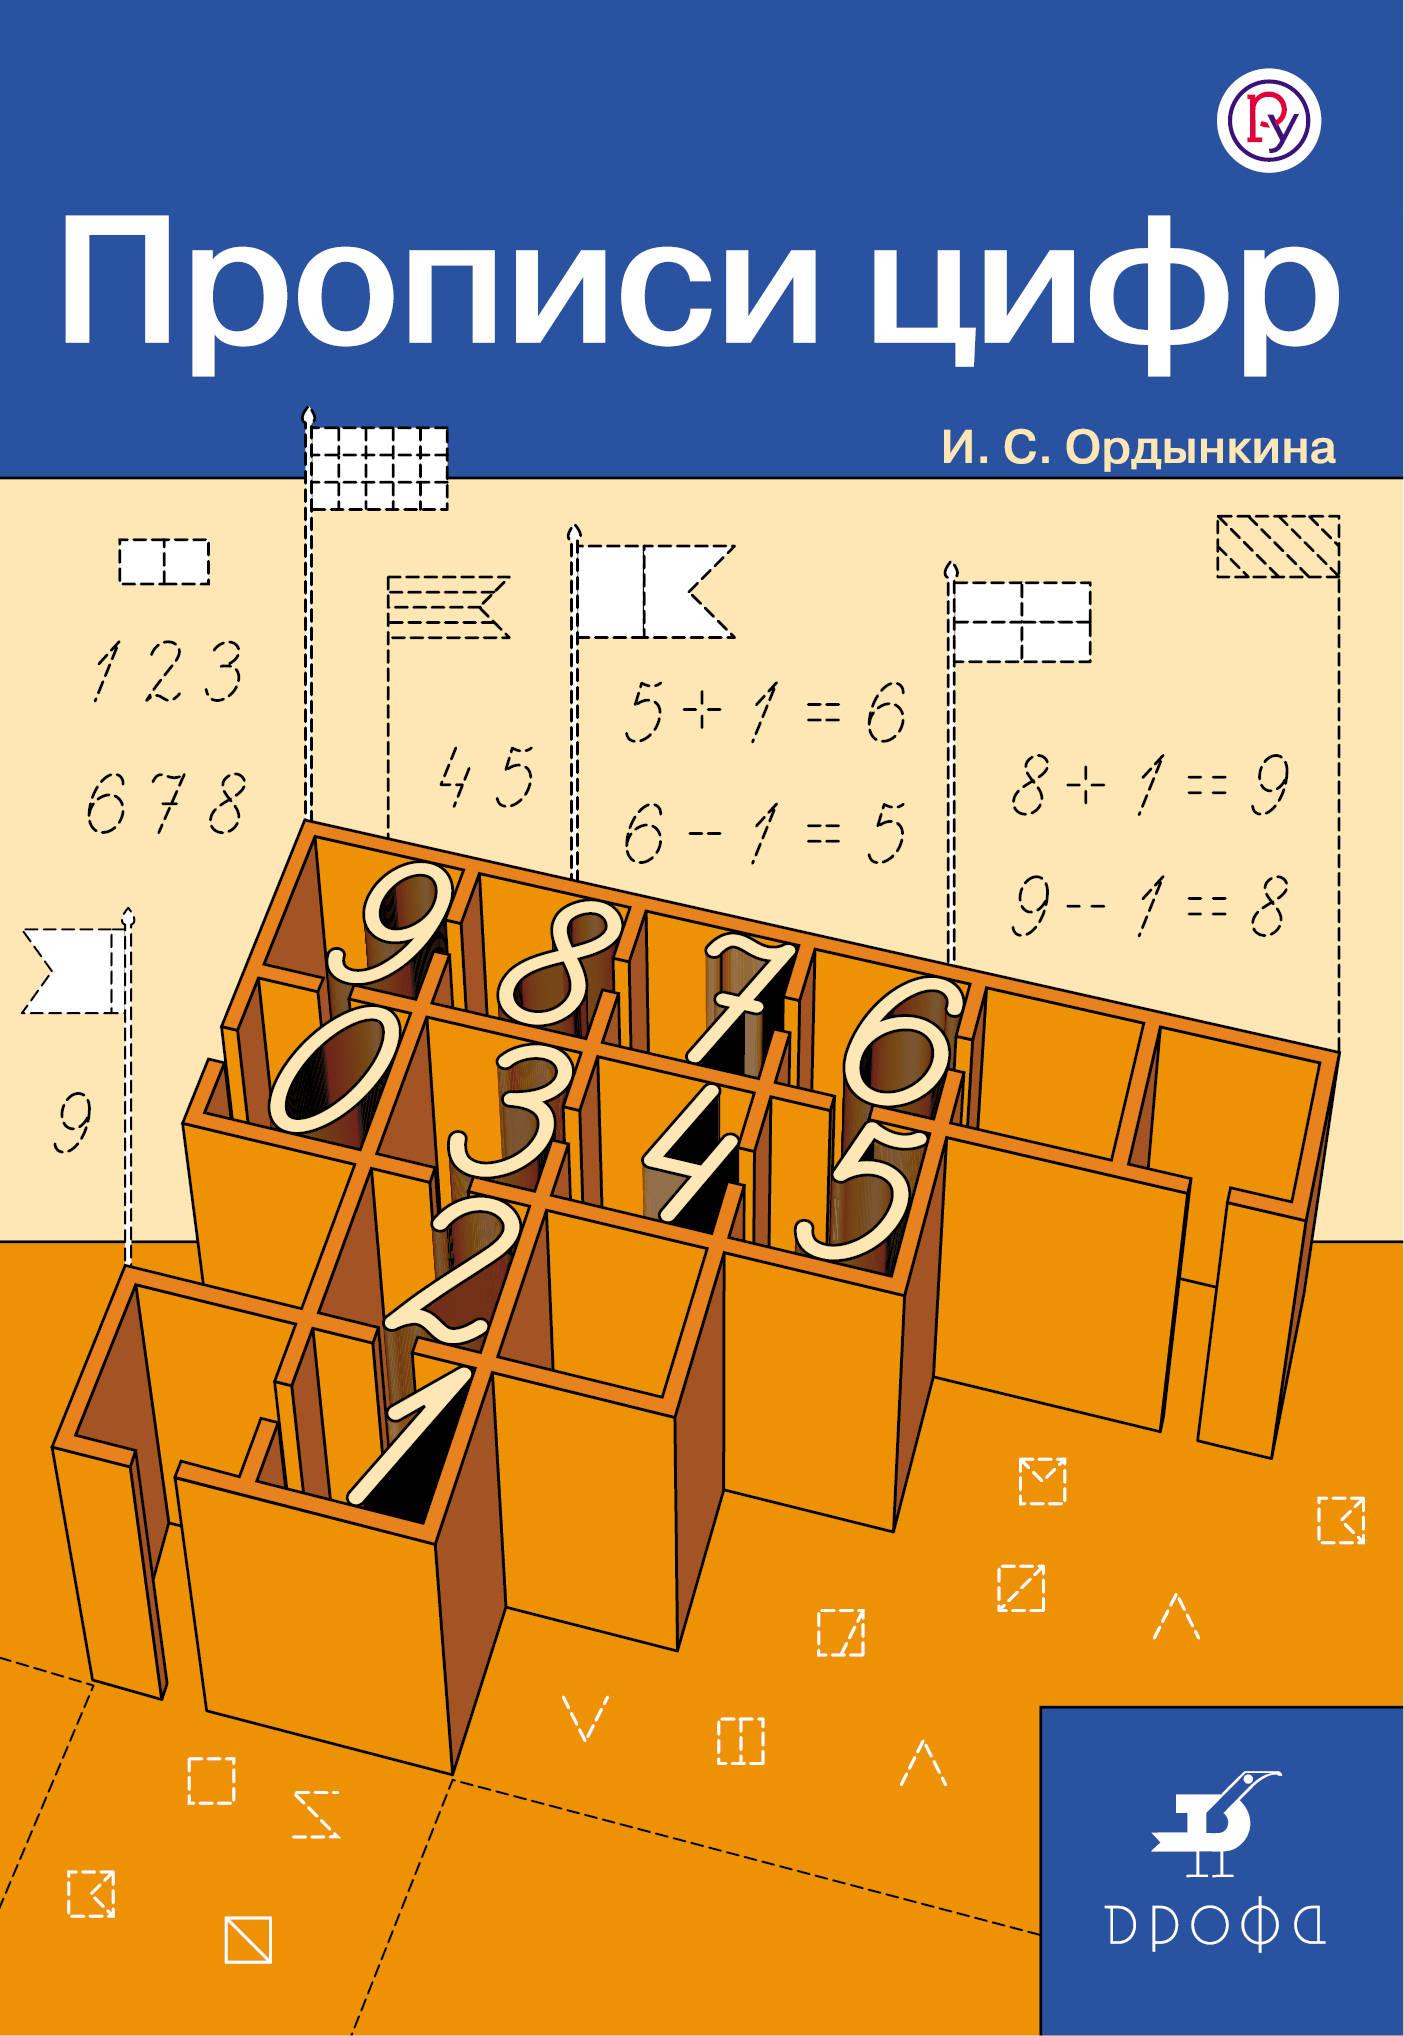 цены И. С. Ордынкина Математика. 1 класс. Прописи цифр